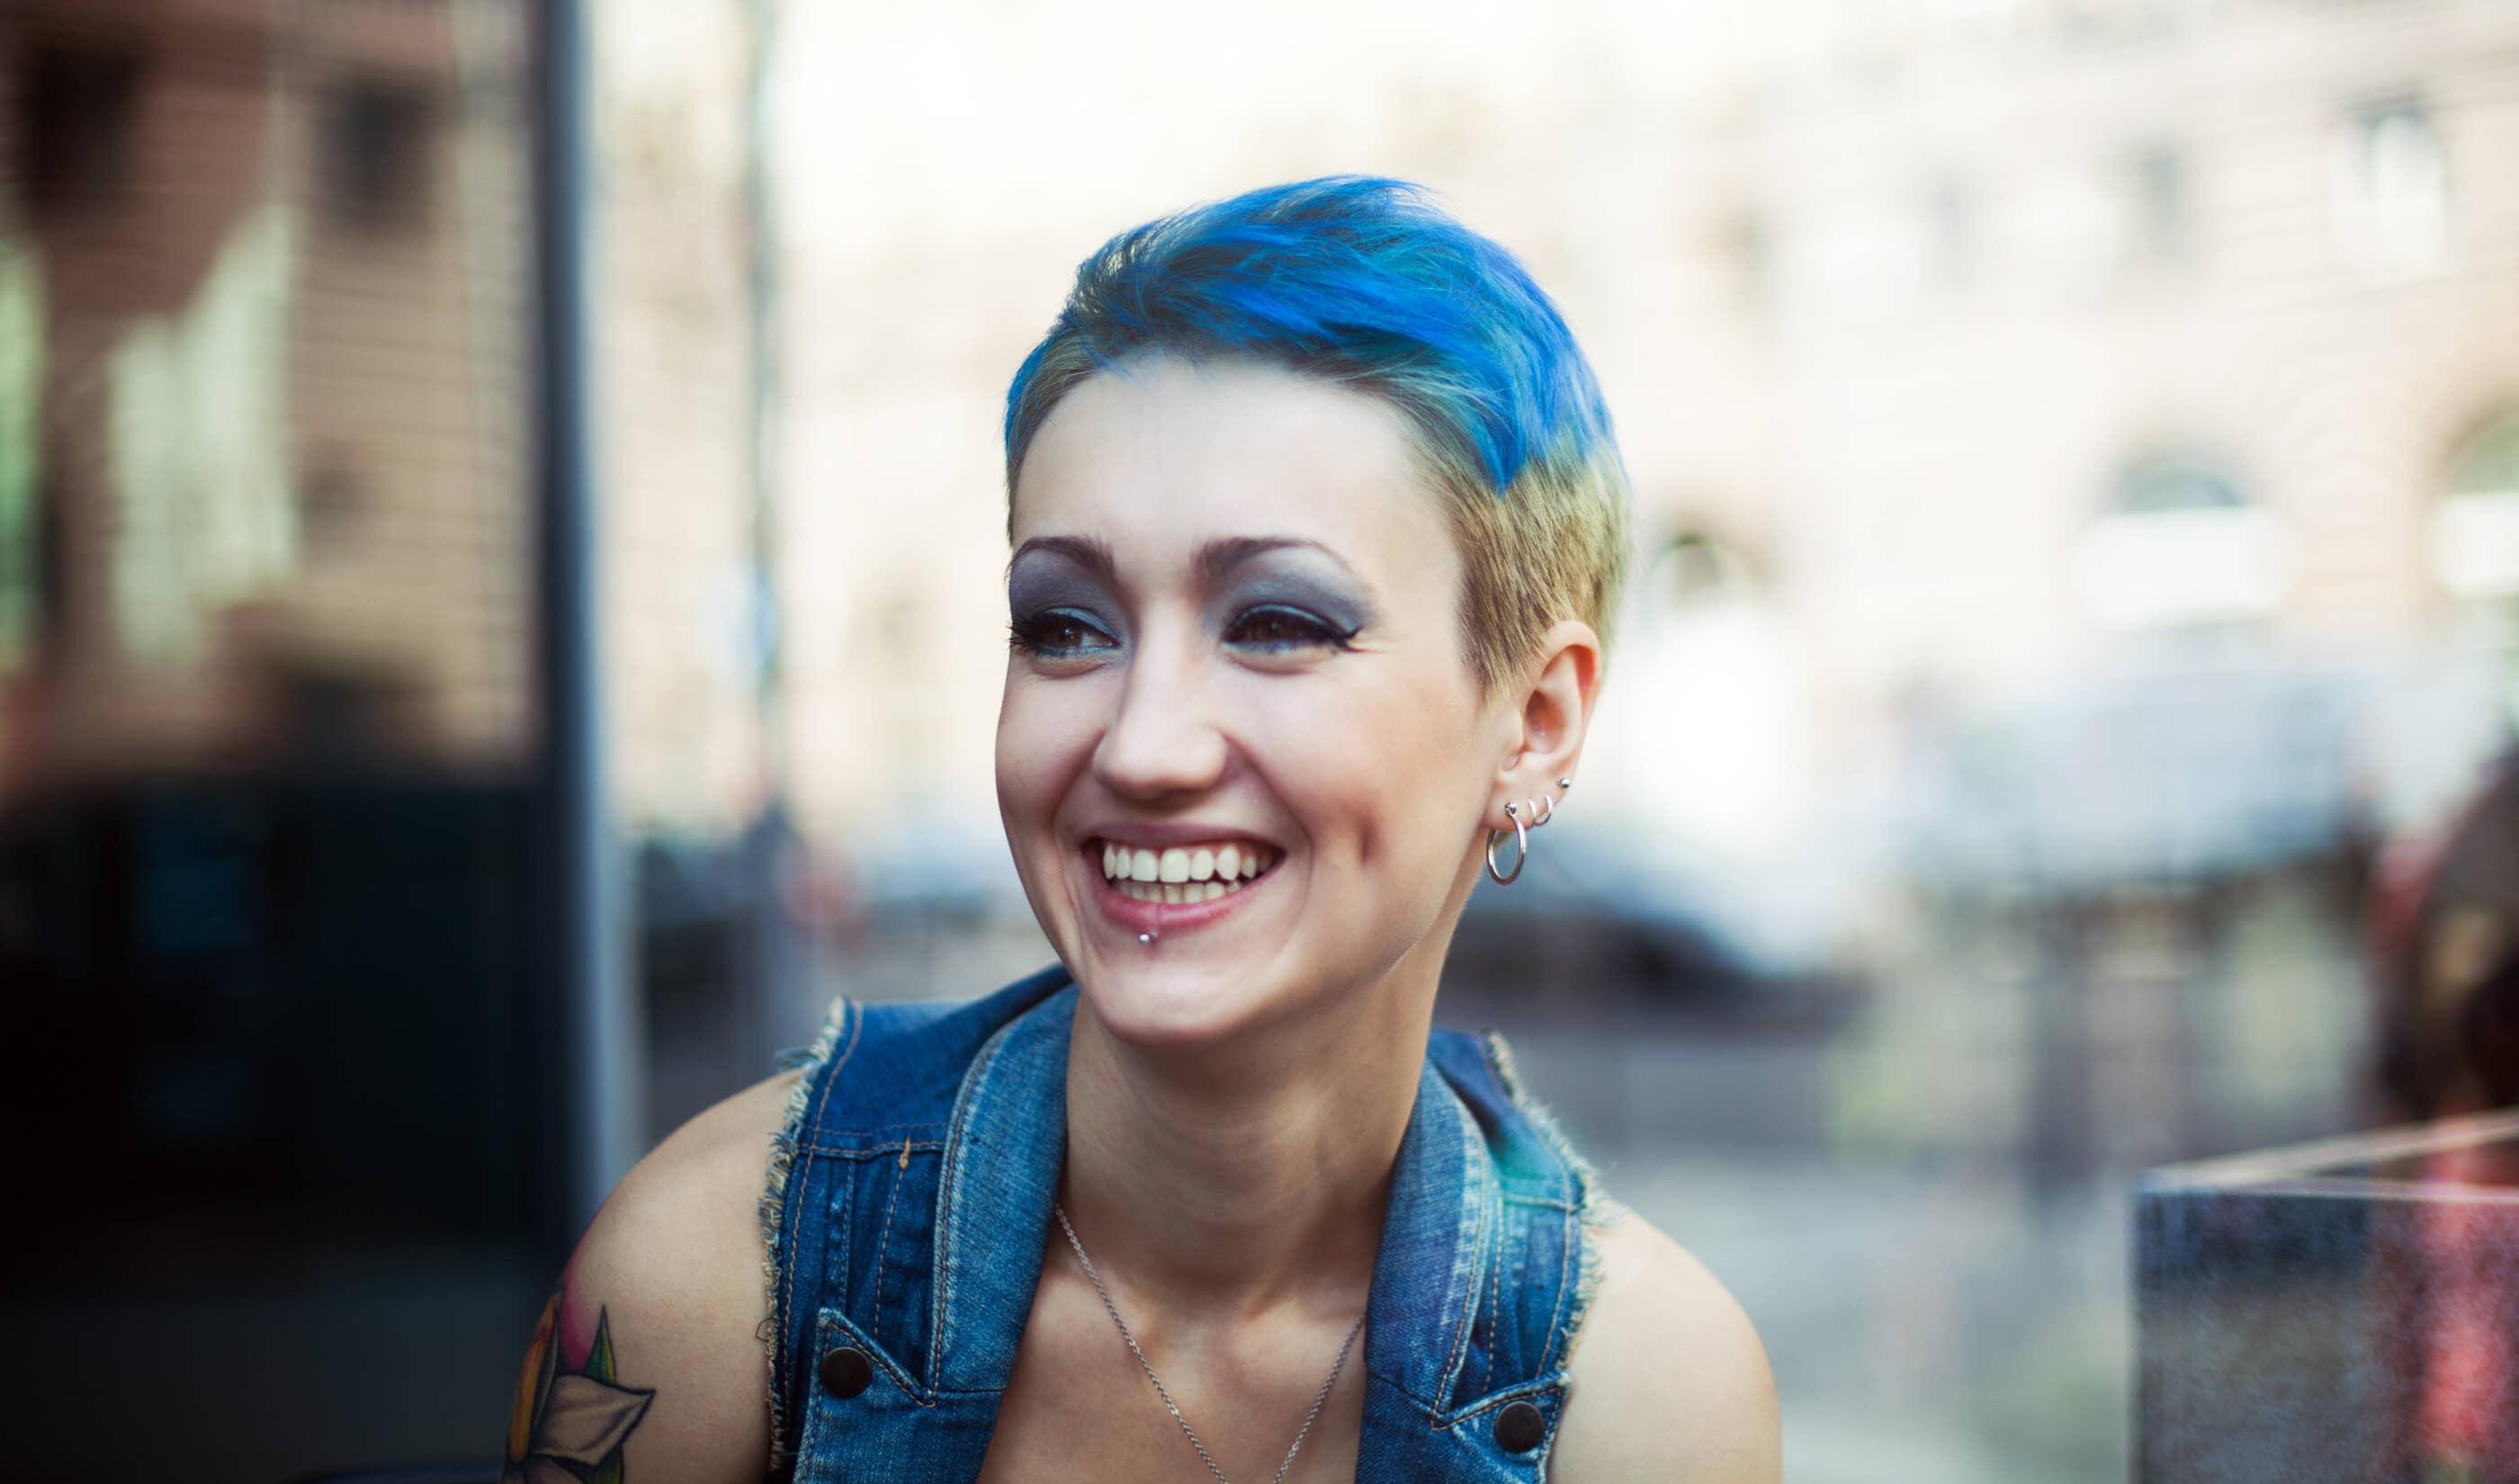 cabello azul pixie cut